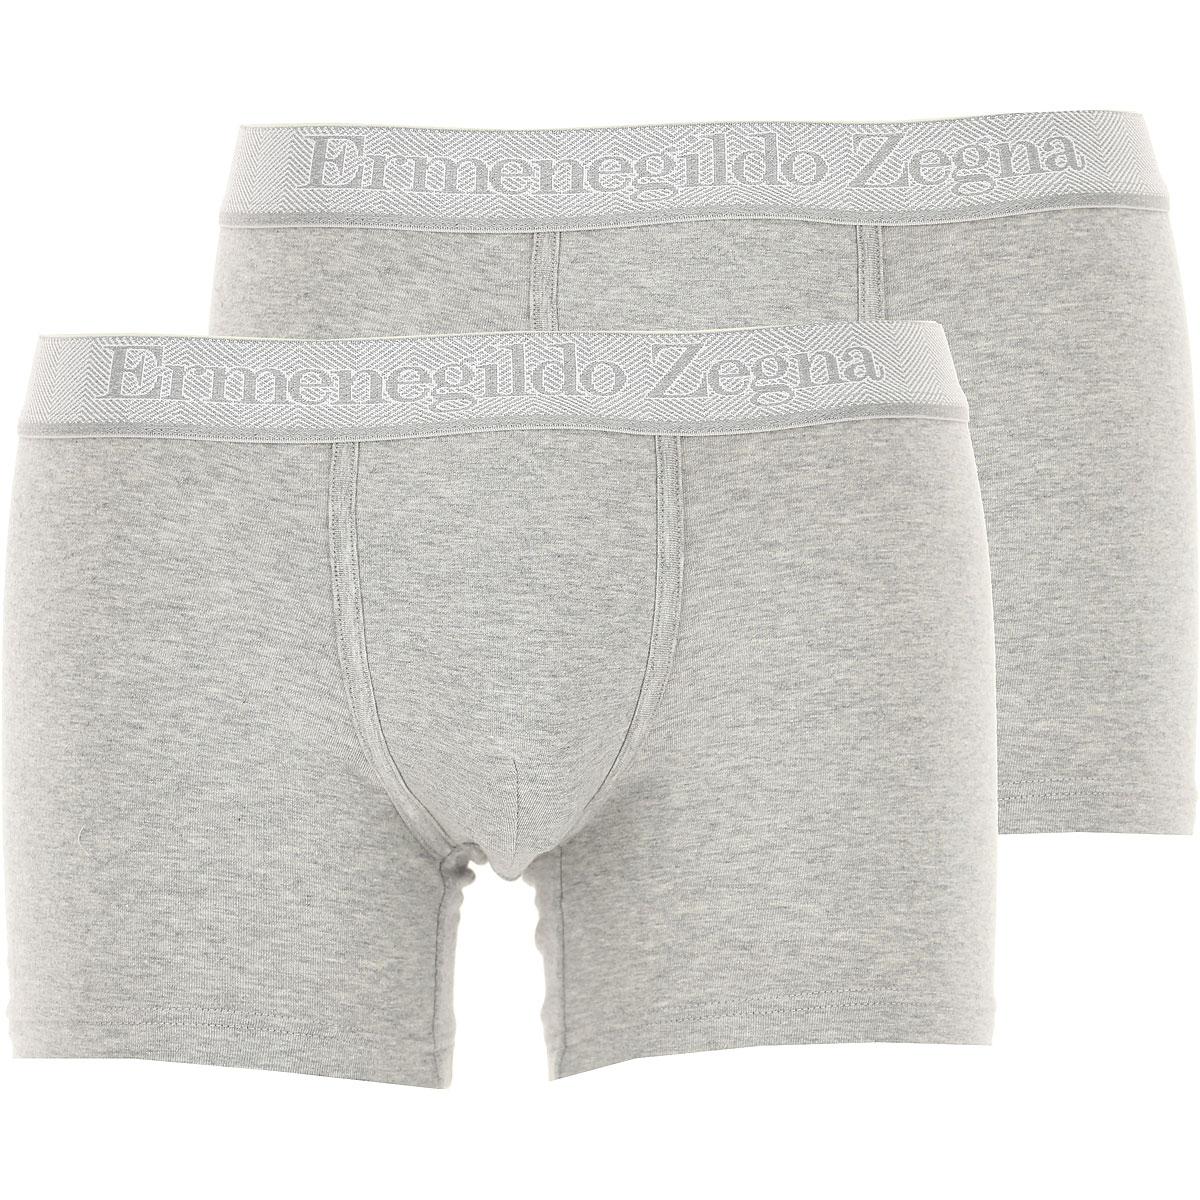 Ermenegildo Zegna Boxer Briefs for Men, Boxers On Sale, 2 Pack, Grey Melange, Cotton, 2019, S (EU 3) L (EU 5) XL (EU 6)